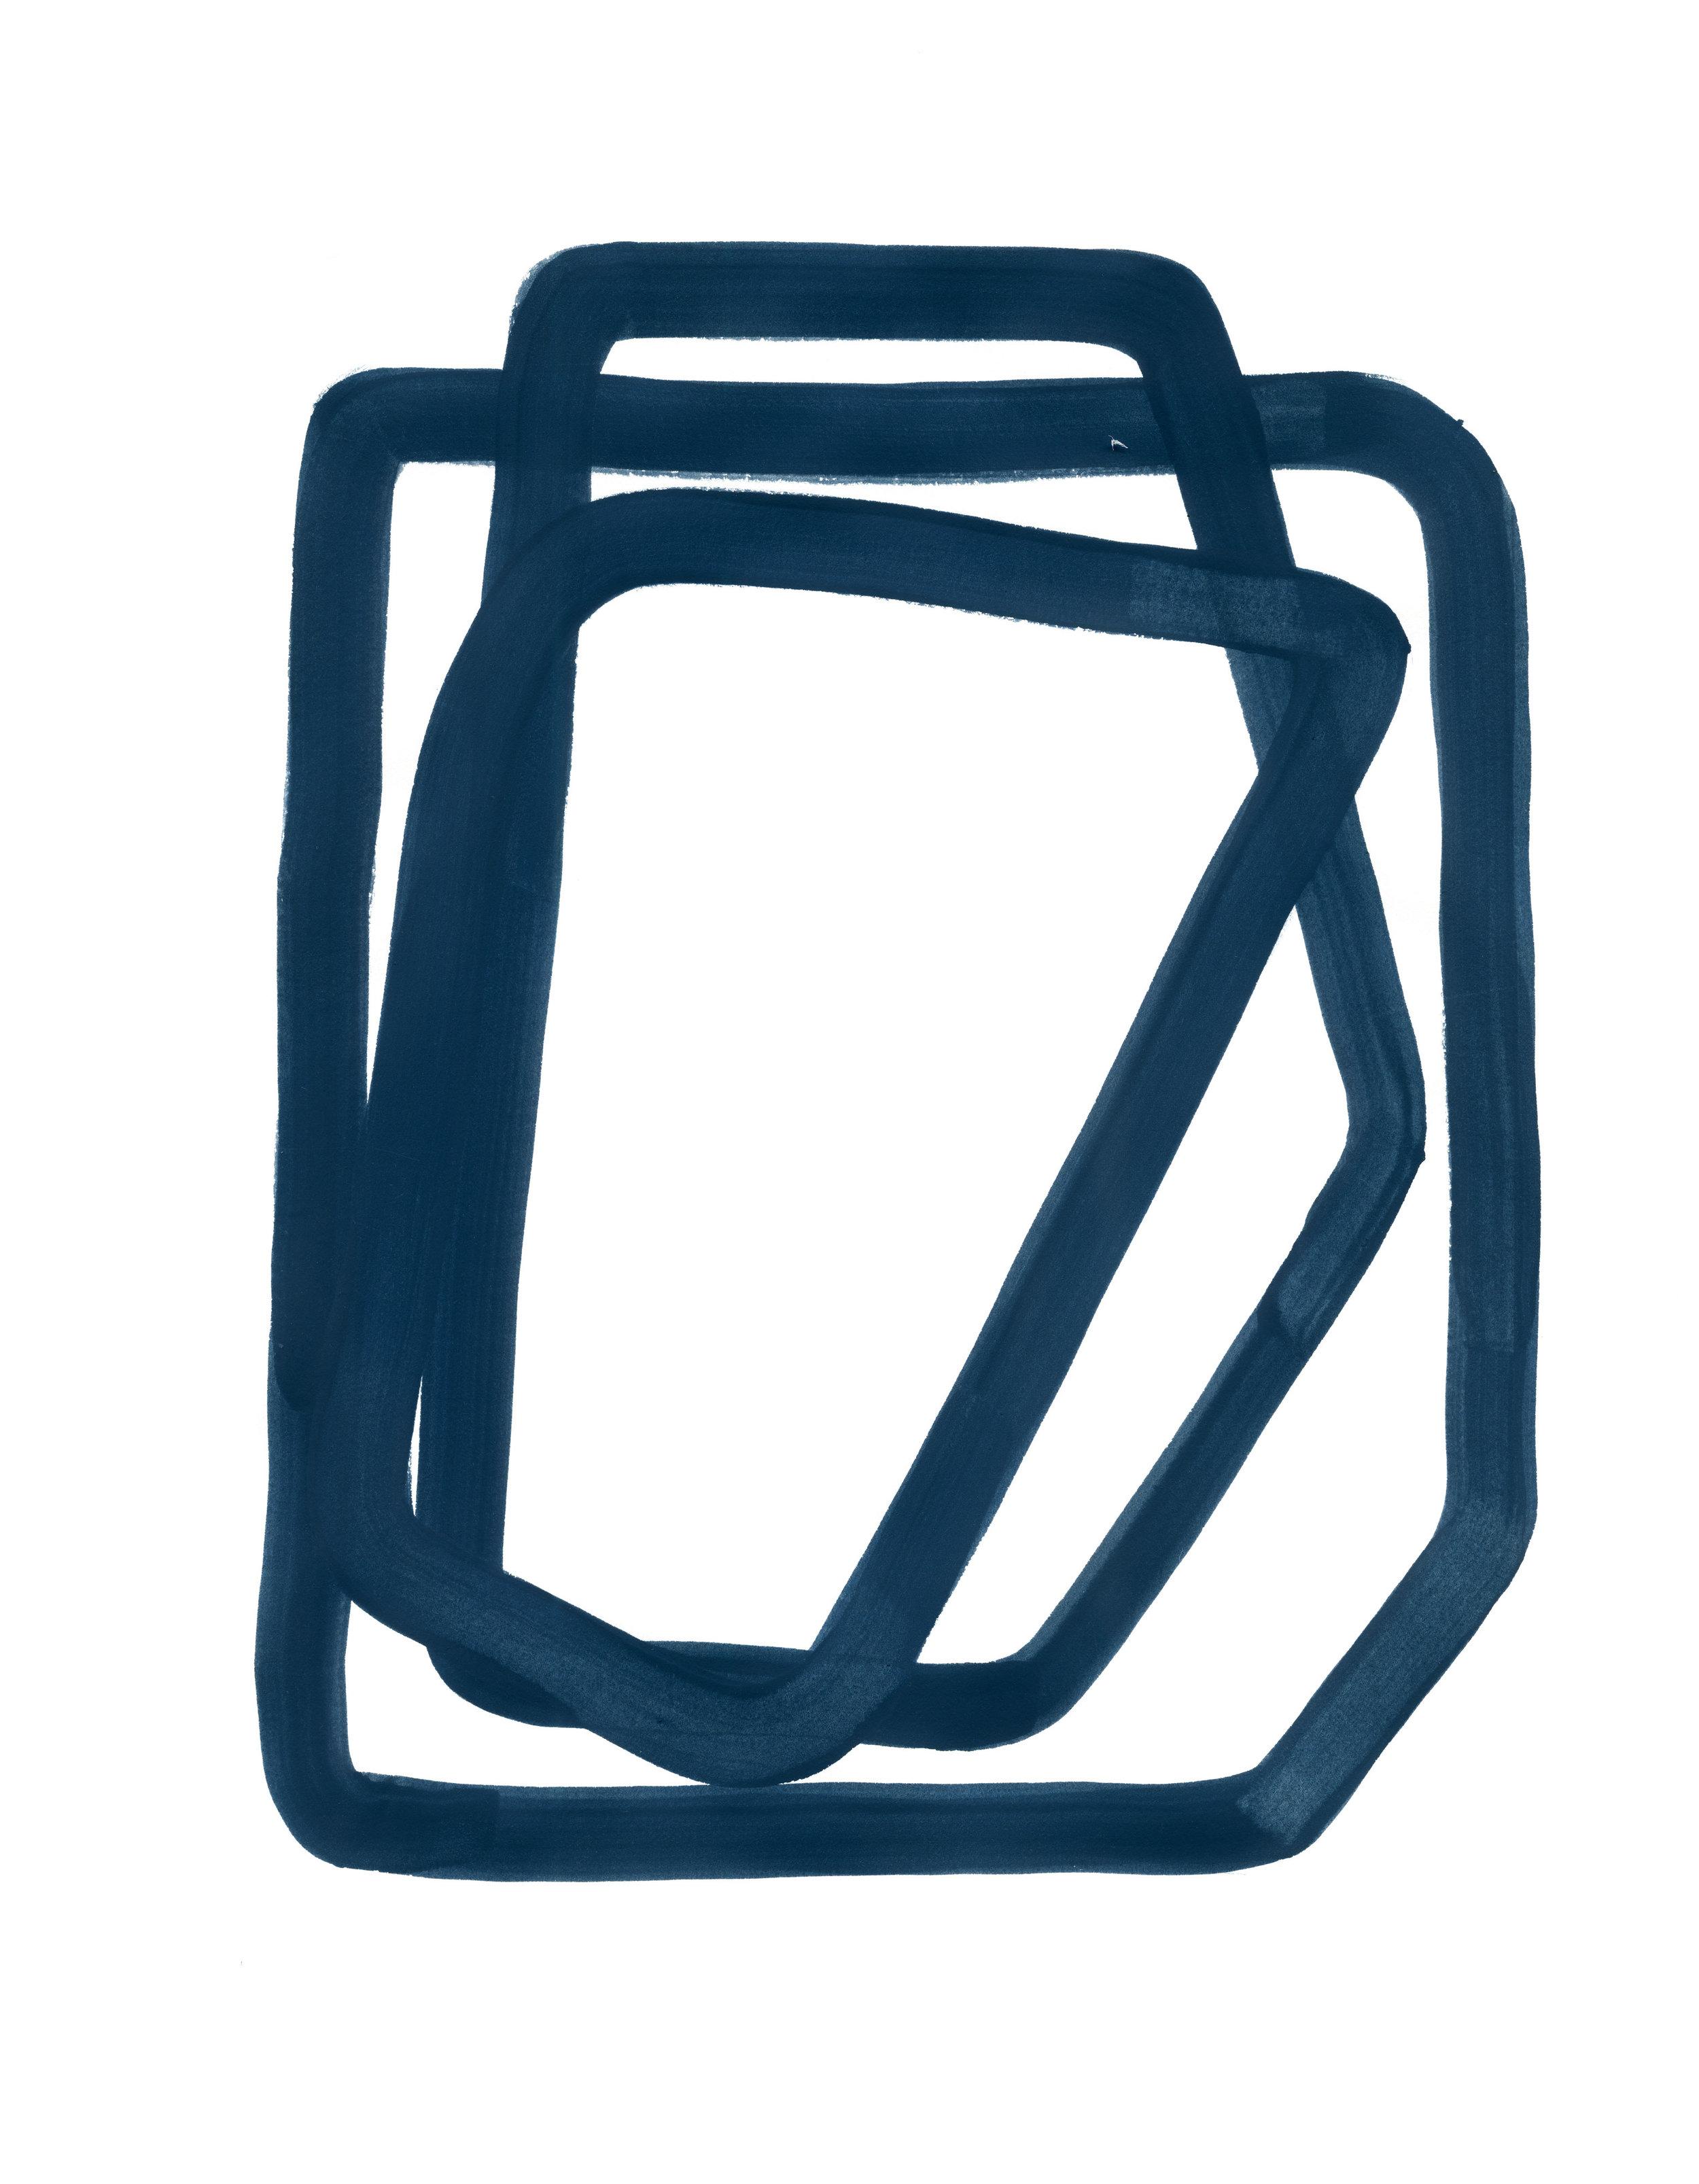 Threes-XII.jpg